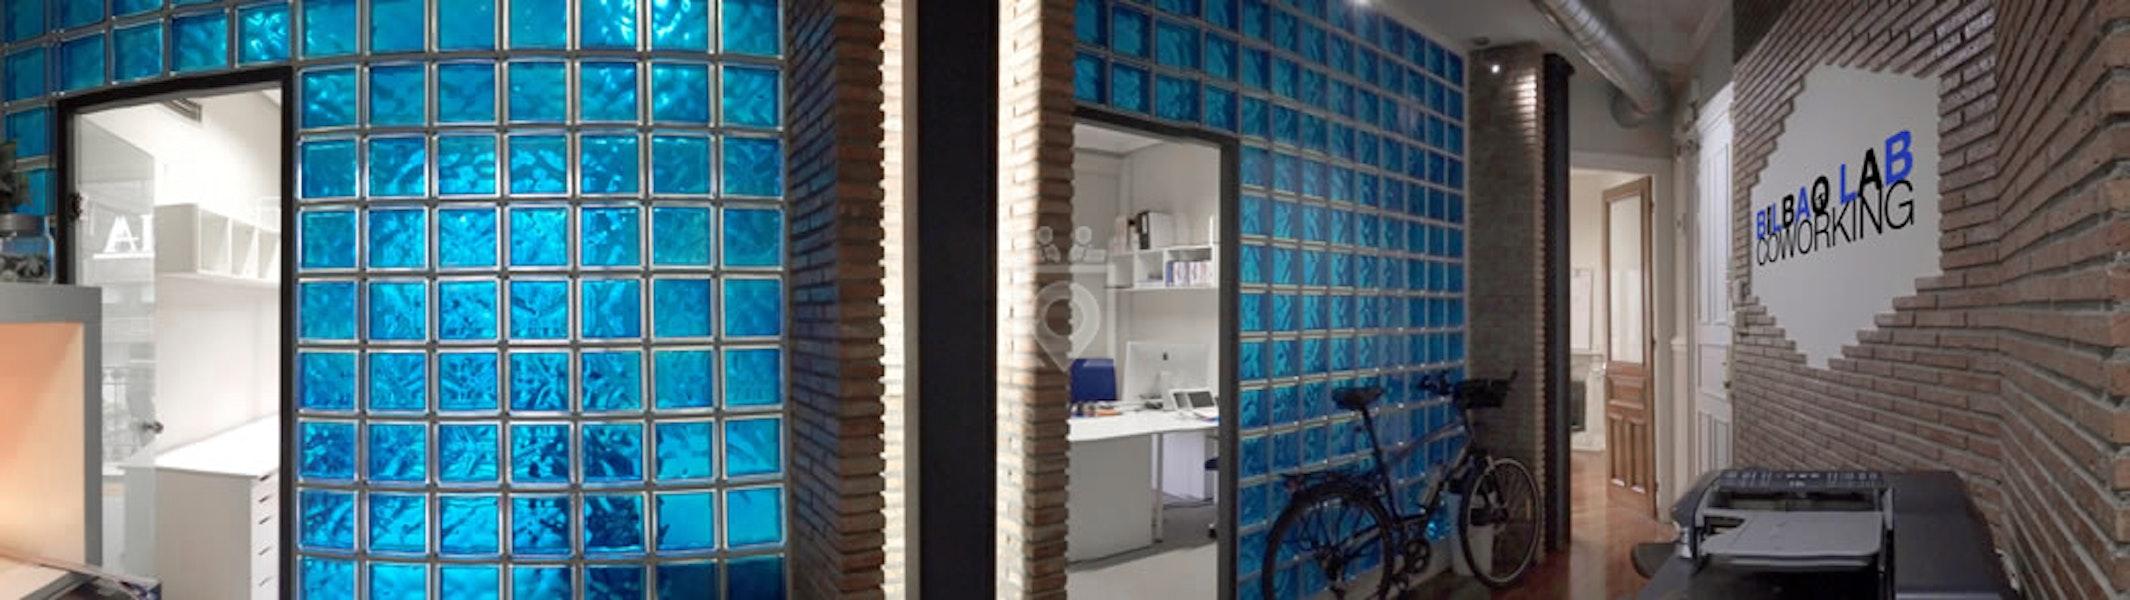 Bilbao Lab Coworking, Bilbao - Read Reviews & Book Online